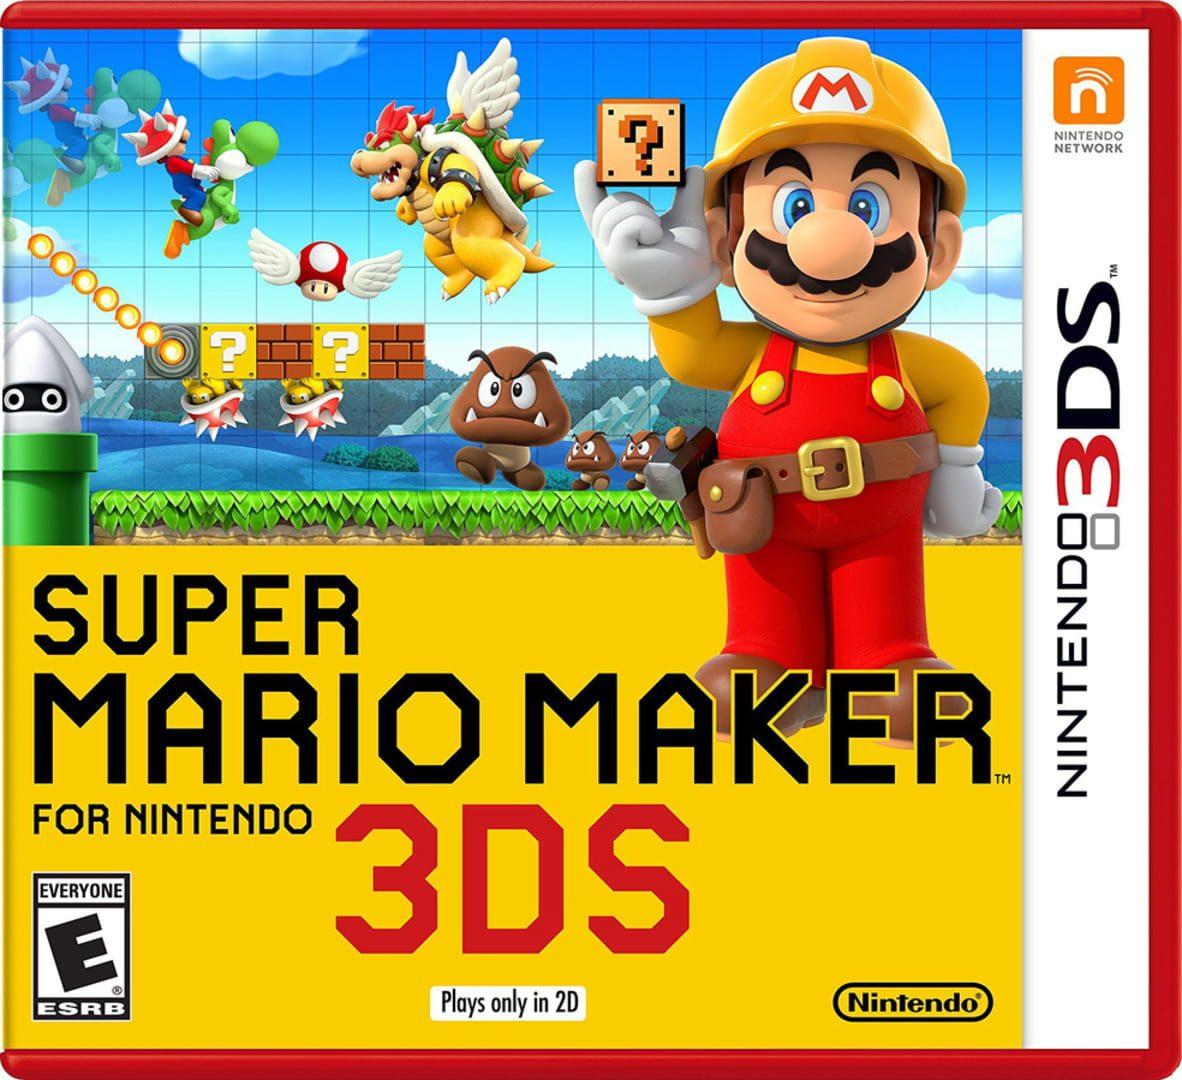 buy Super Mario Maker for Nintendo 3DS cd key for all platform